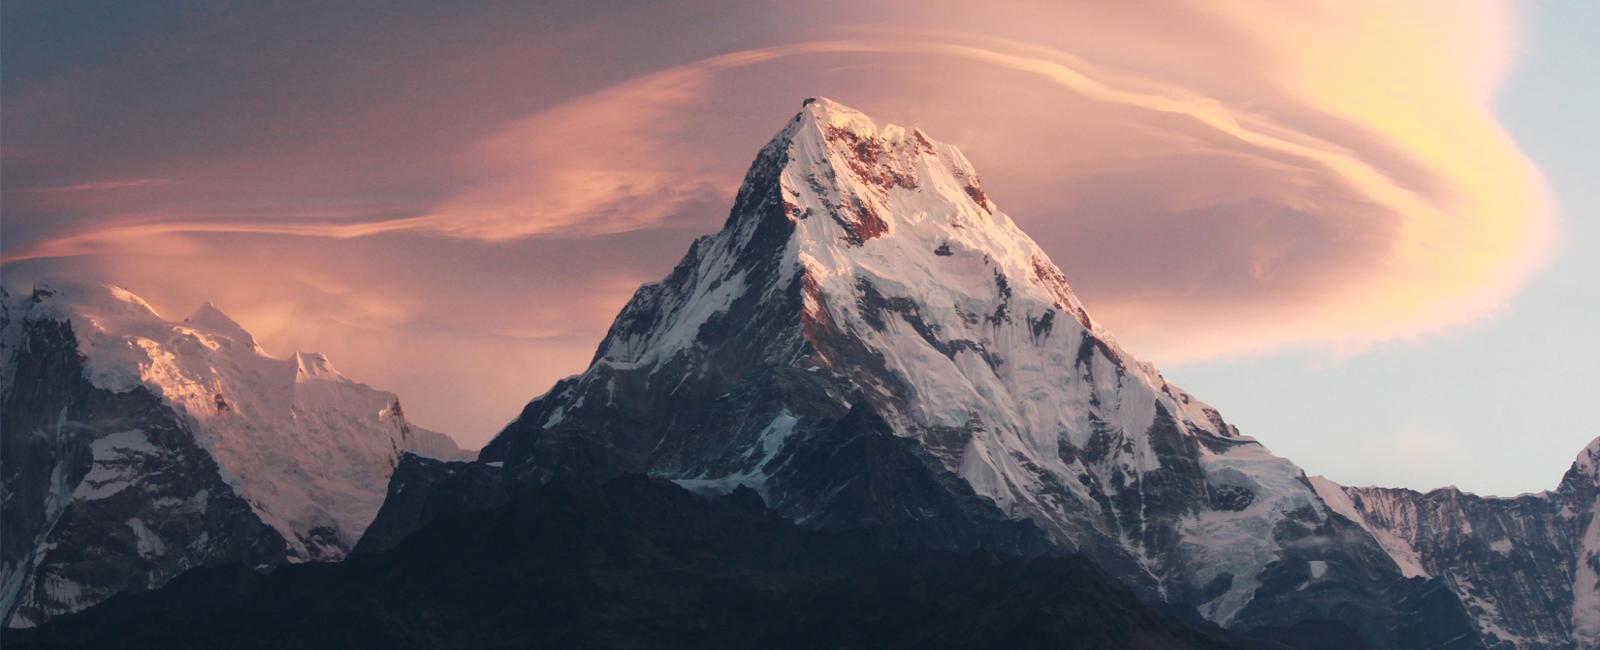 Annapurna himalayan range from Poon Hill